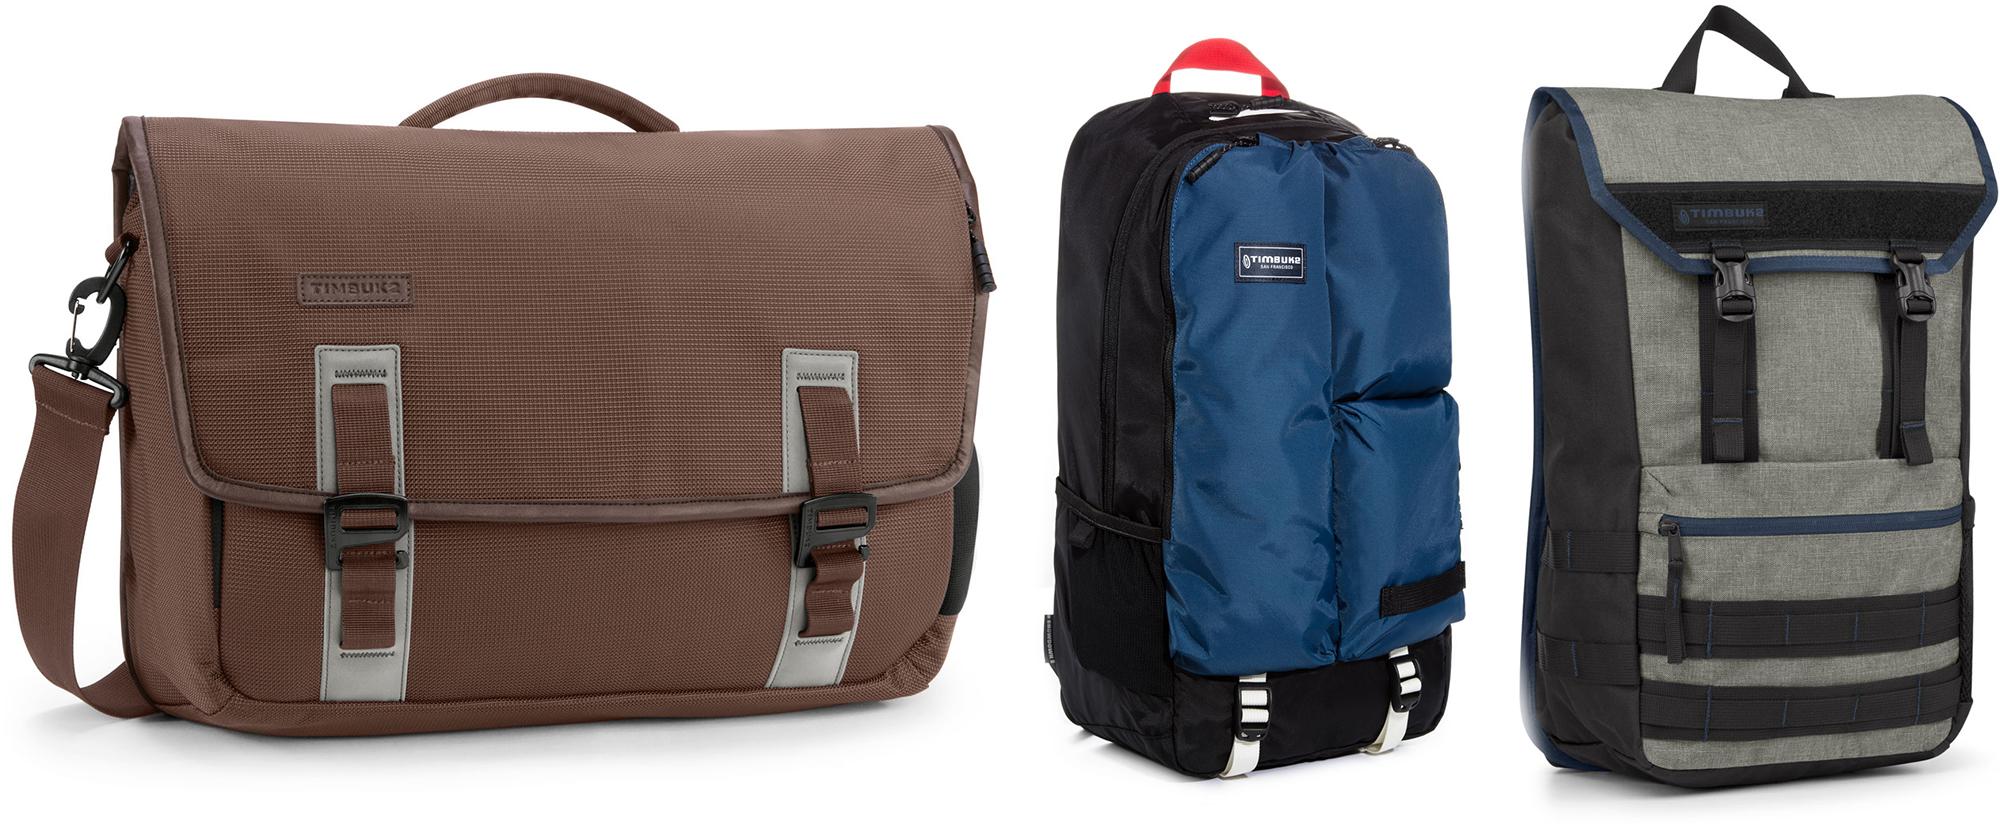 timbuk2-messenger-bag-sale